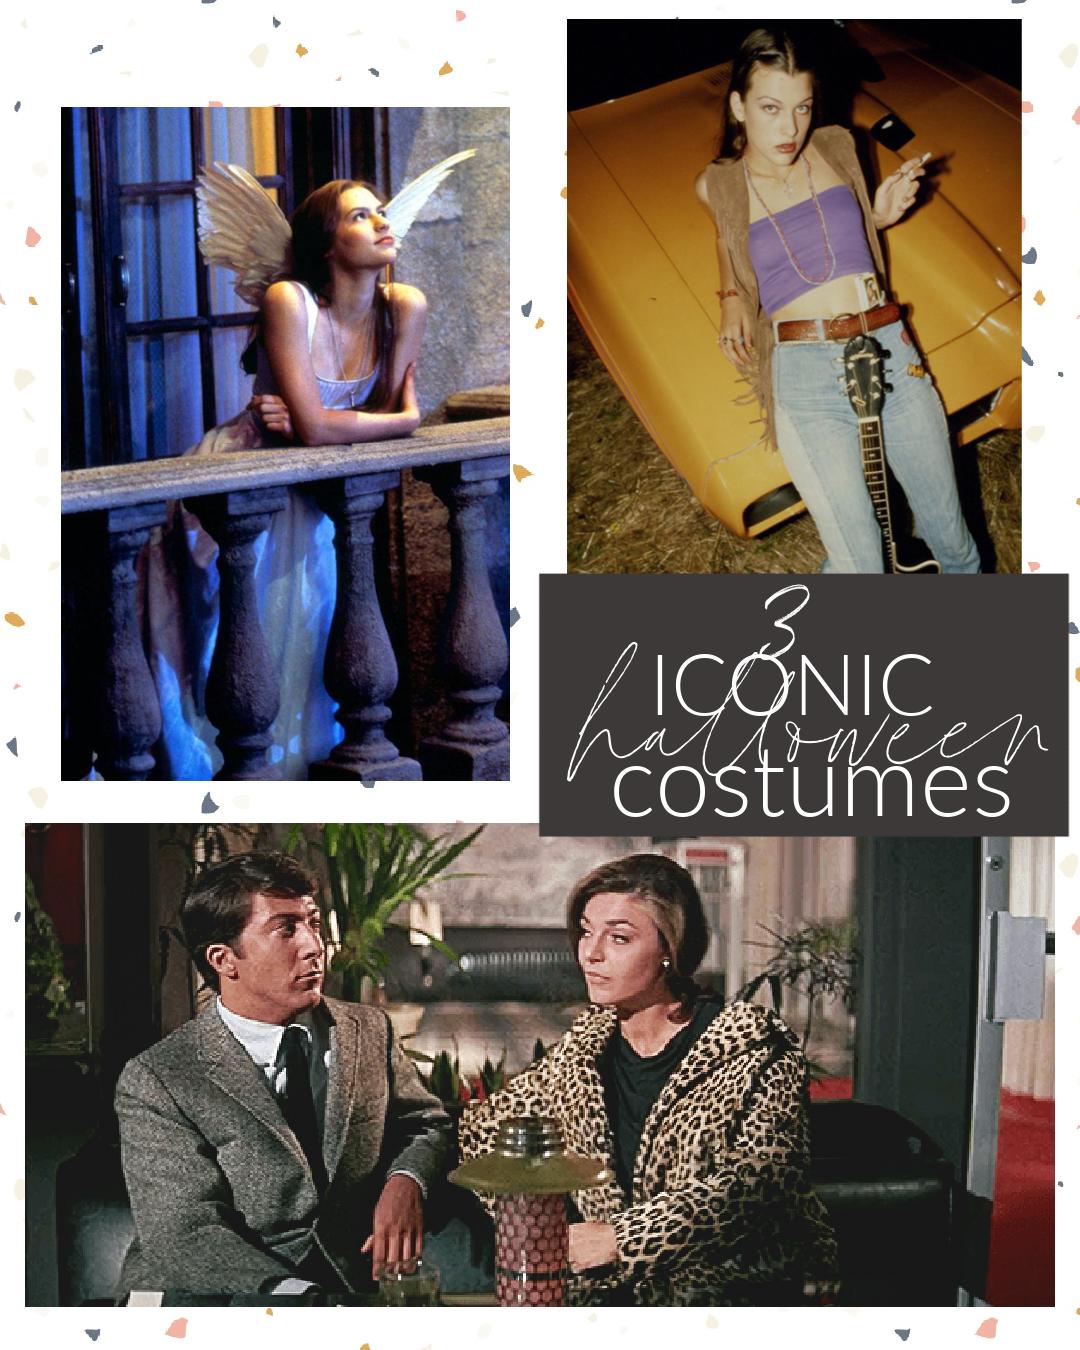 3 Iconic Halloween Costumes